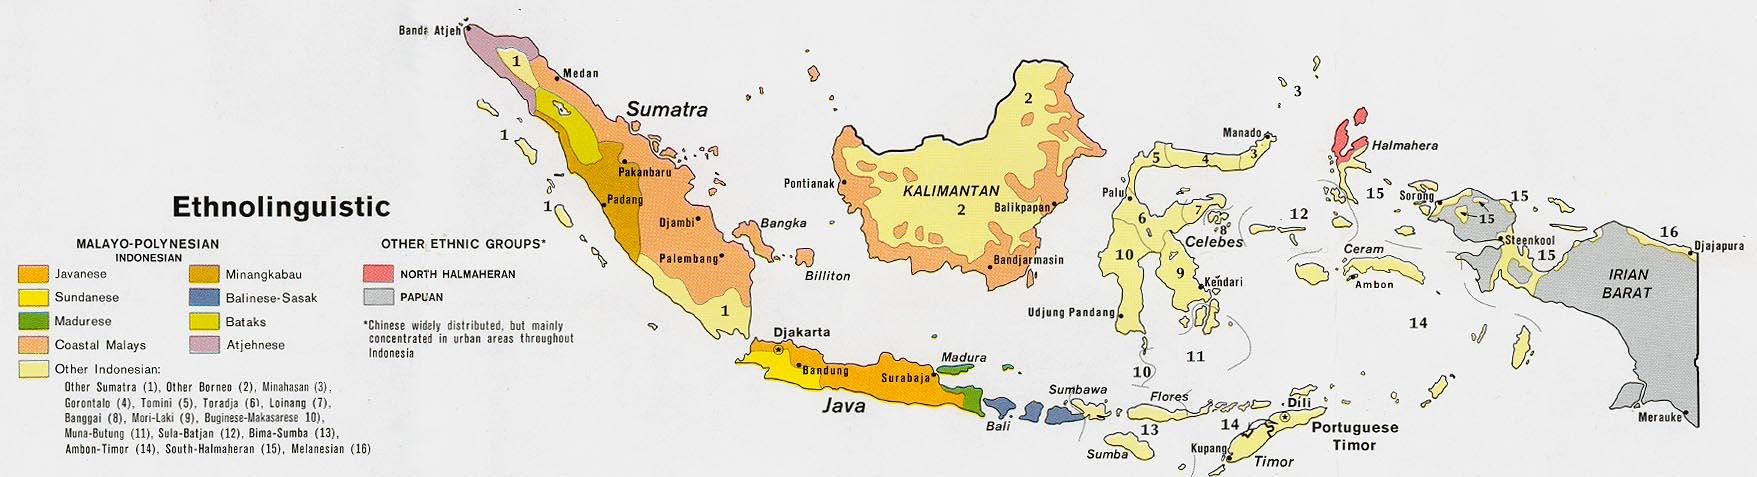 Indonésie - ethno-linguistique